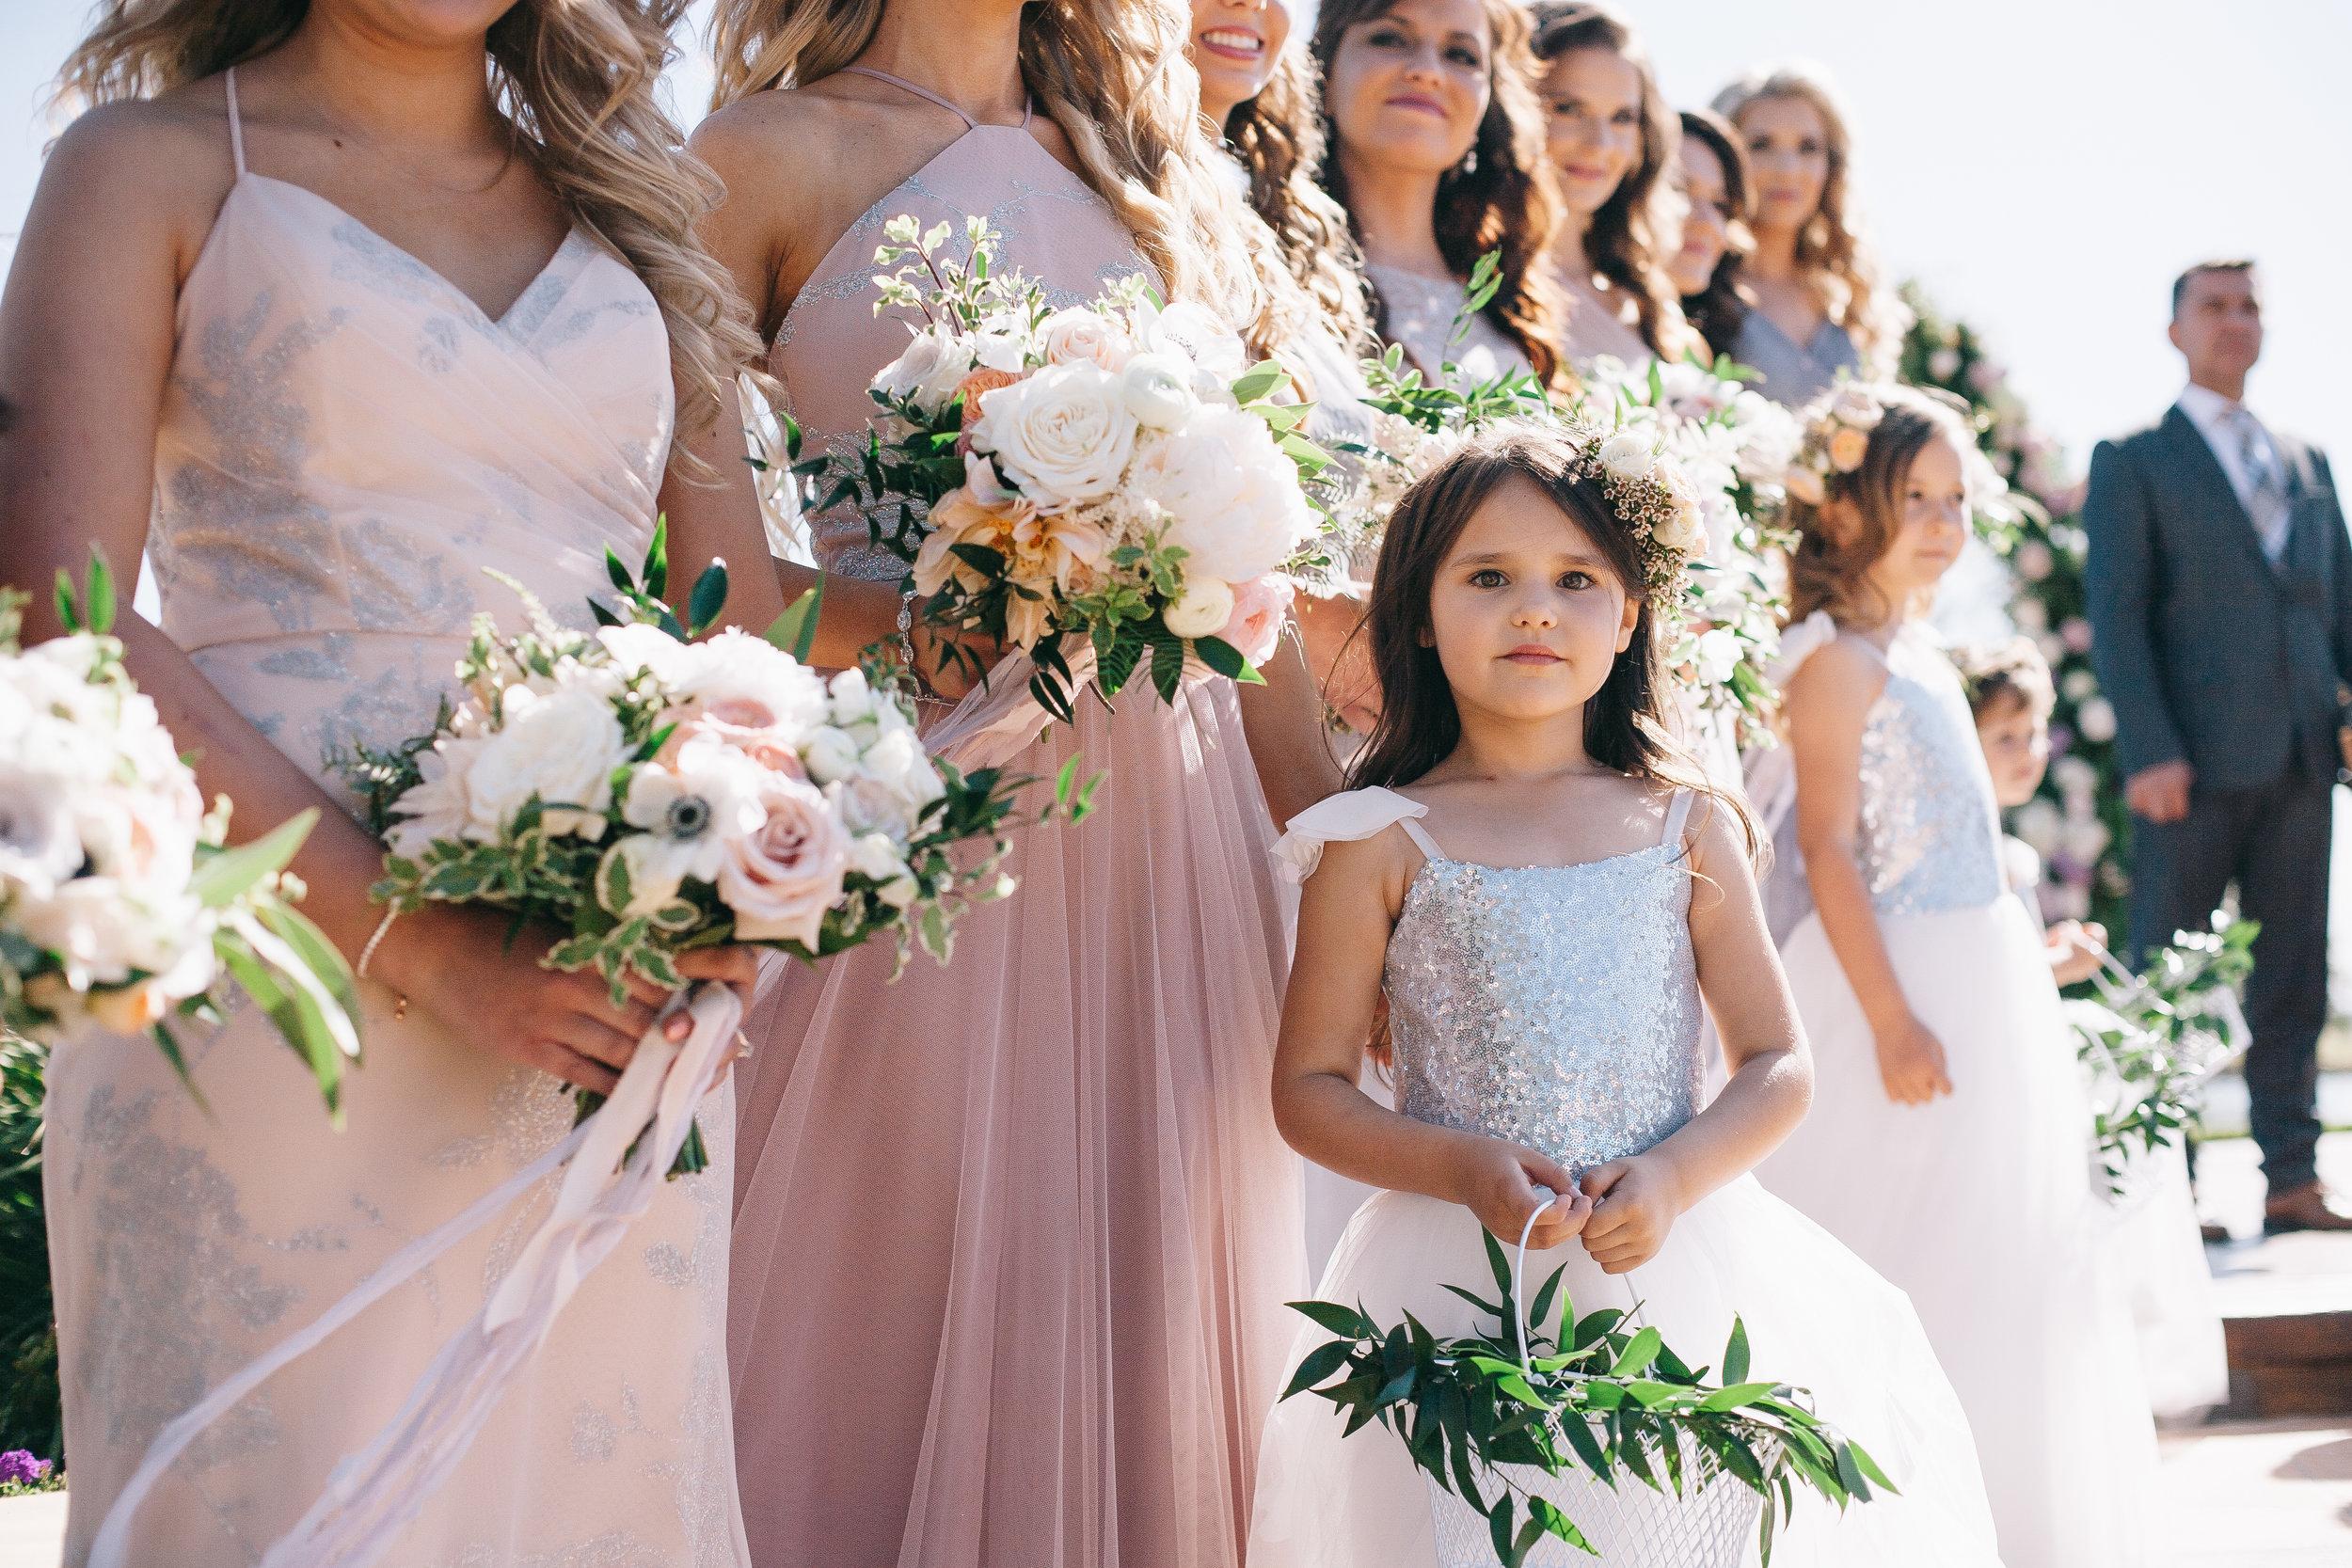 Violette-fleurs-event-design-roseville-anna-perevertaylo-rancho-robles-vinyards-Detail-Destination-Bliss-Wedding-design.jpg